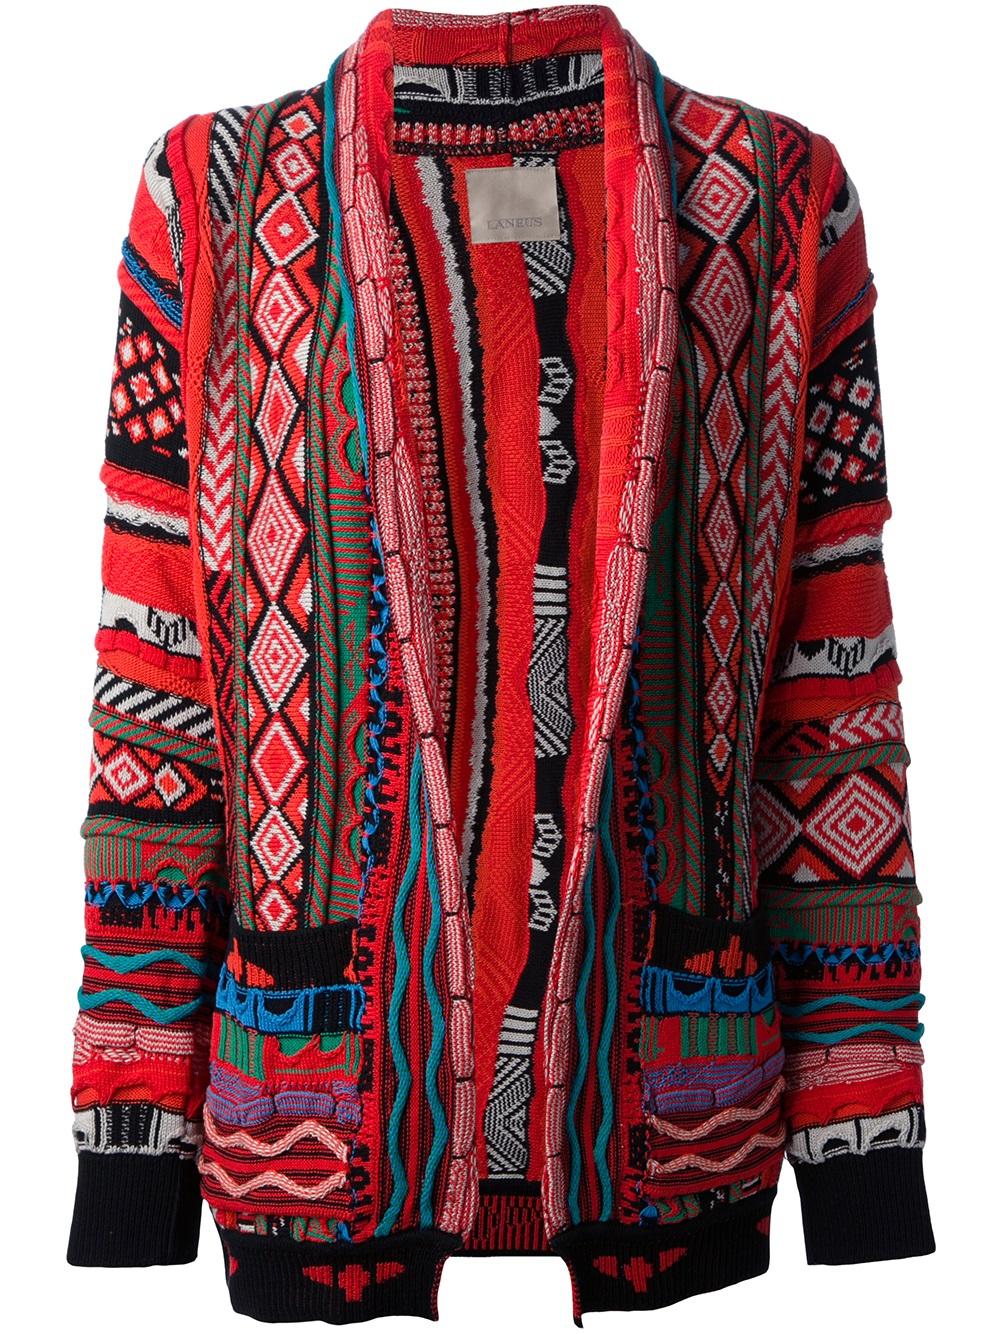 KNITWEAR - Cardigans Laneus Cheap Great Deals Sale Online Shopping New For Sale Bi4yGXSPr